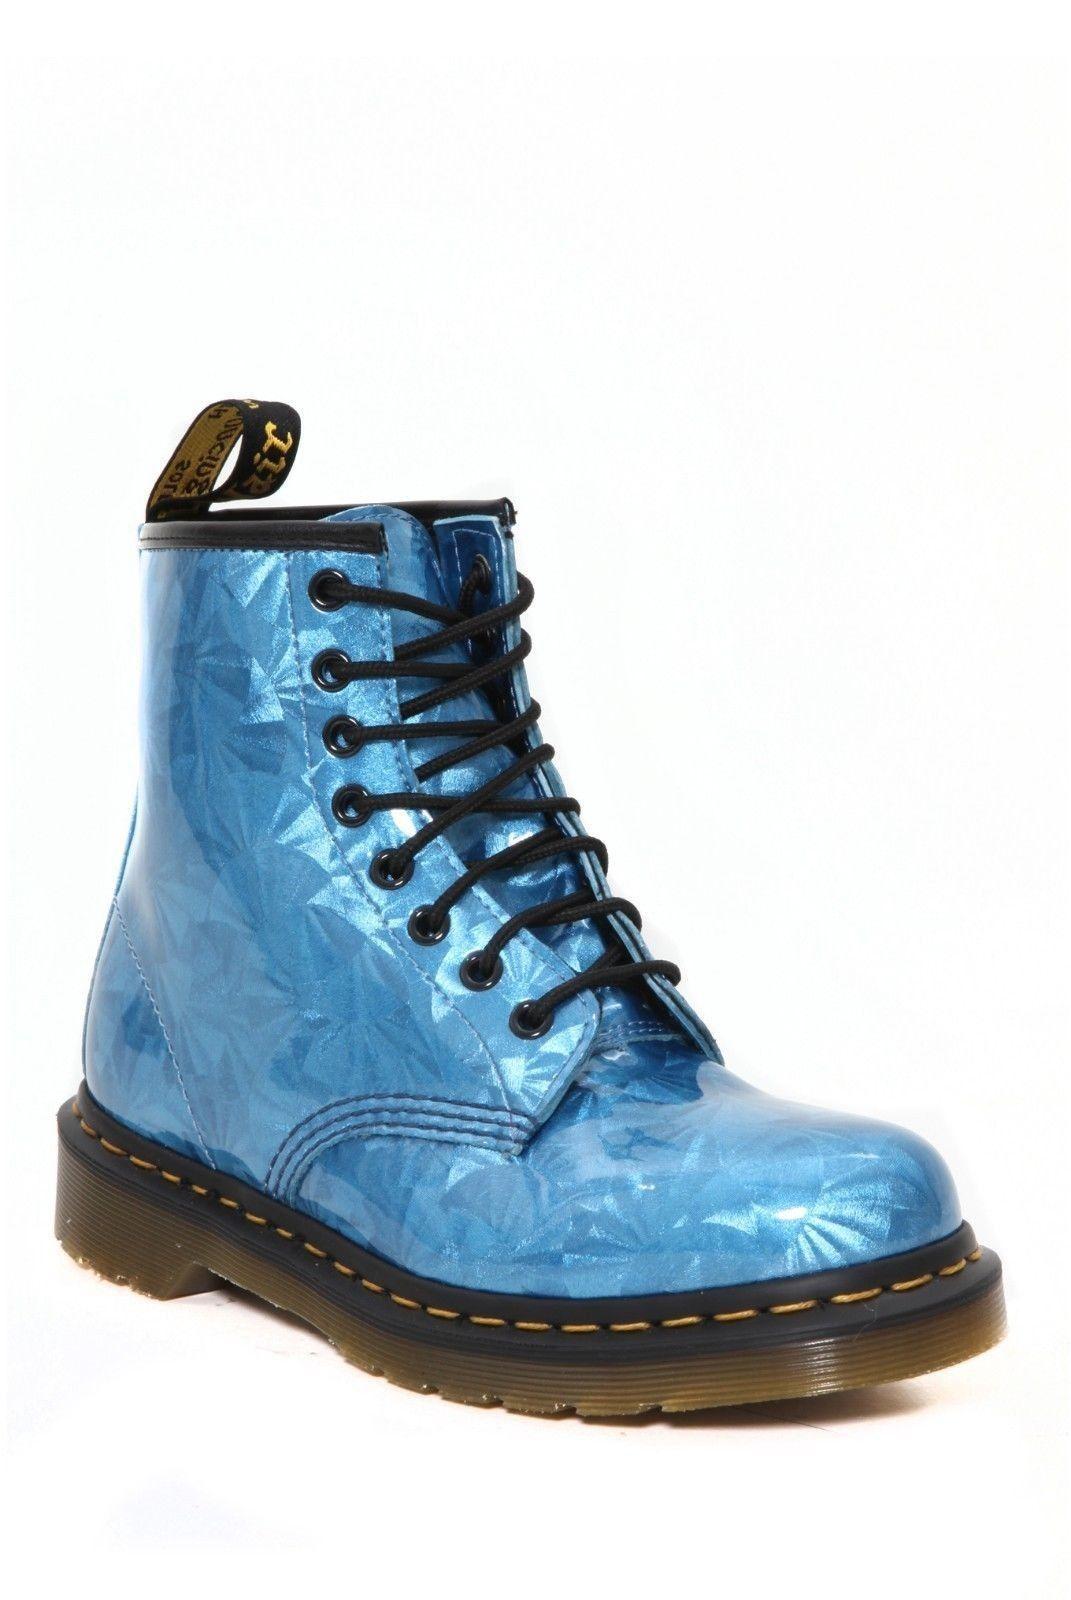 NEW Dr. Martens Sapphire Jewel 8-Eye Zip Boots Hot Topic Punk Cyber Steampunk